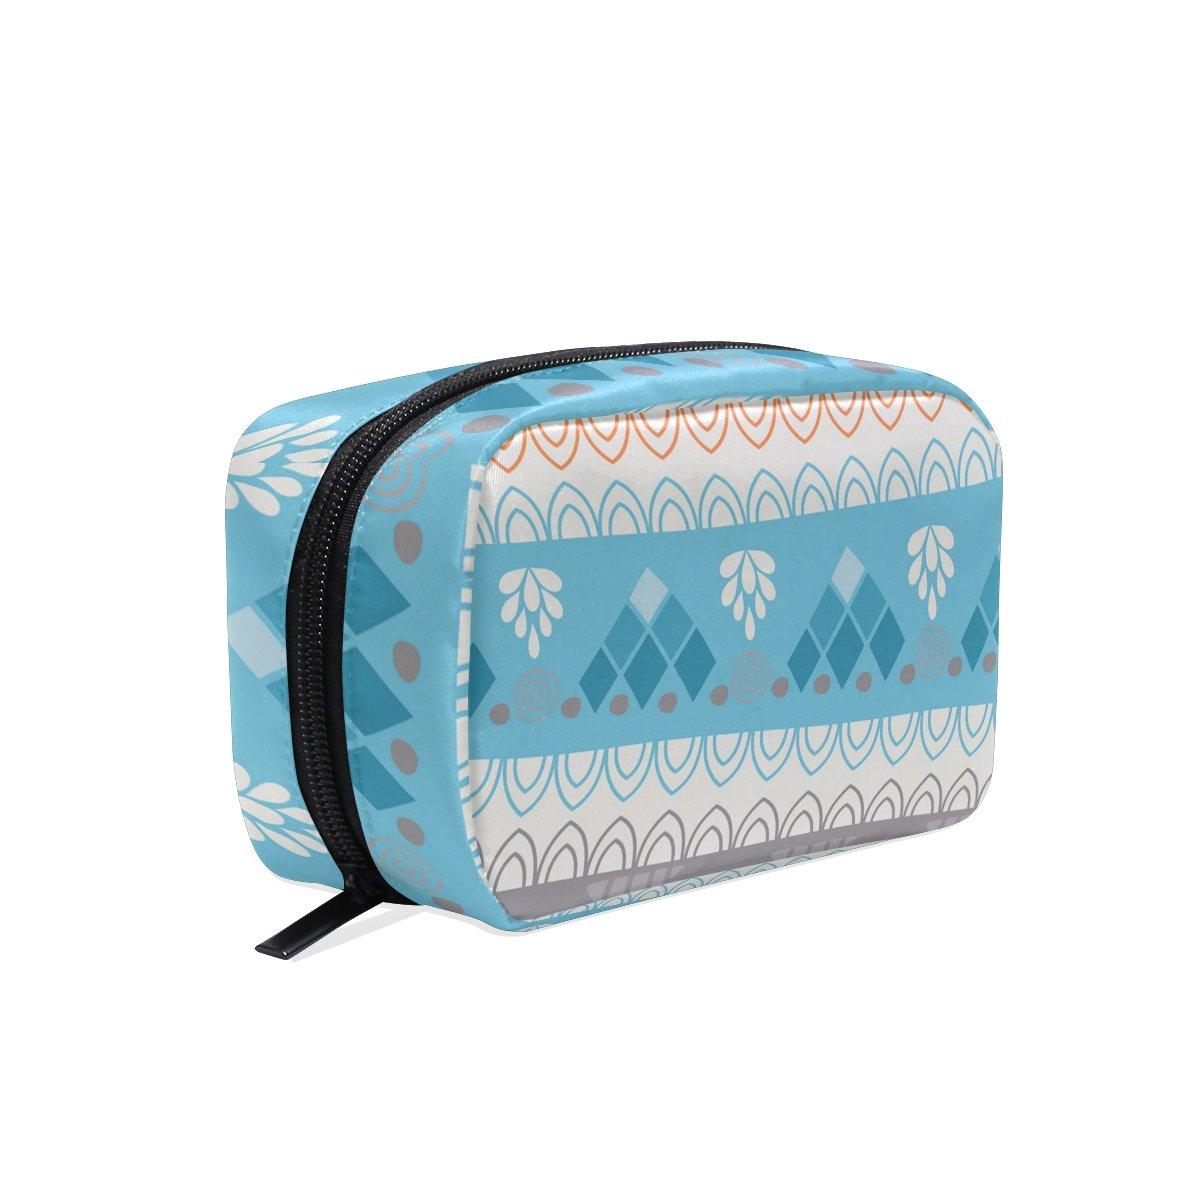 OREZI Toiletry Bag for women Girl Floral Stripe Cosmetic Bag Portable Travel Makeup Bag Organizer